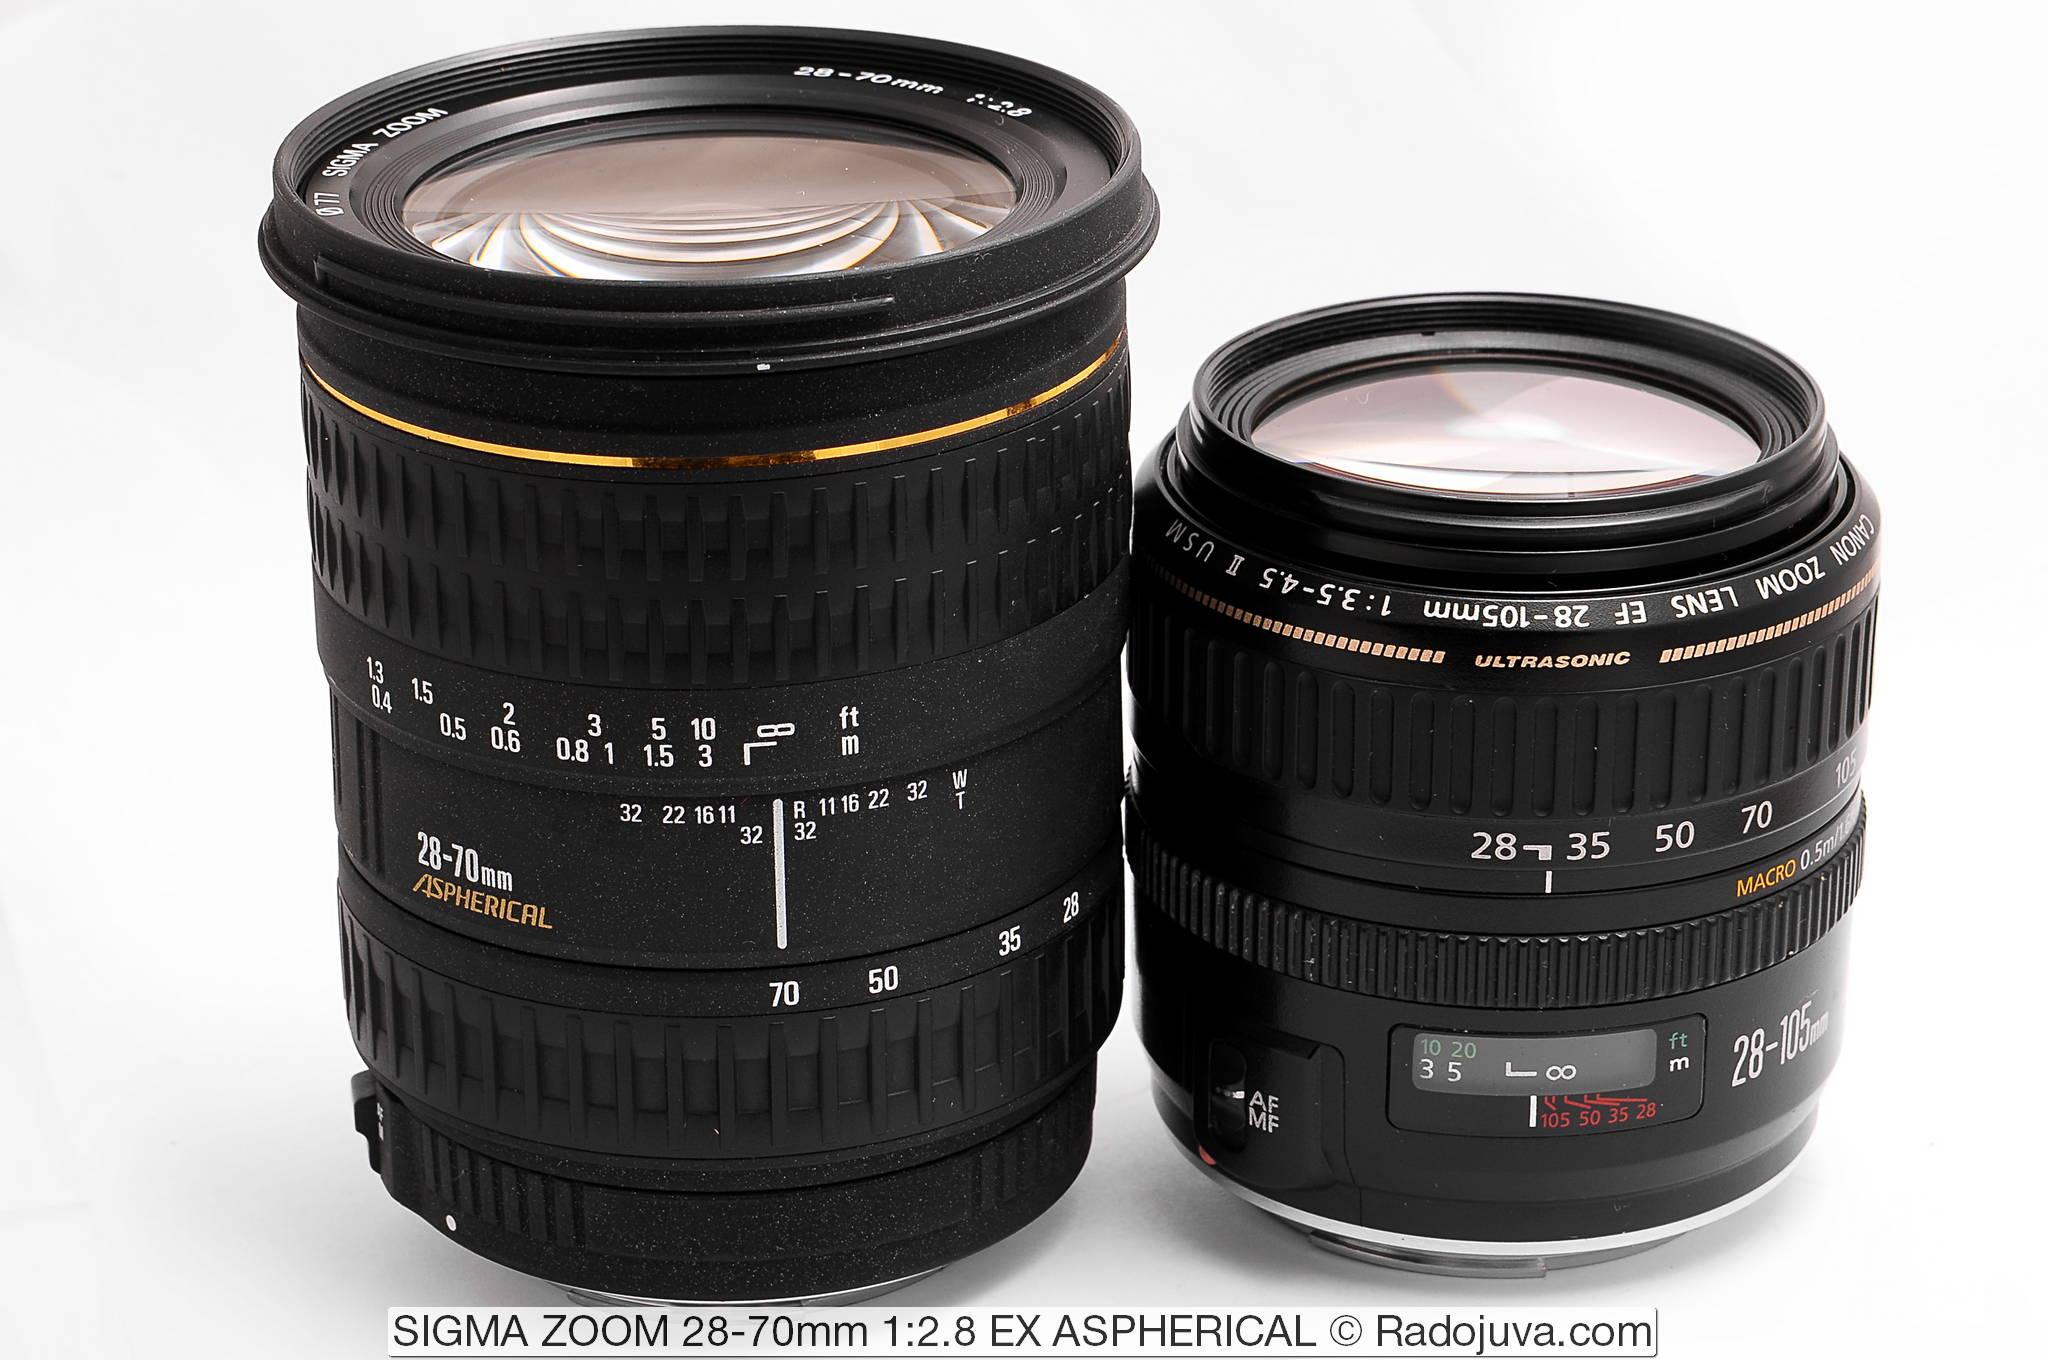 SIGMA ZOOM 28-70mm 1: 2.8 EX ASPHERICAL